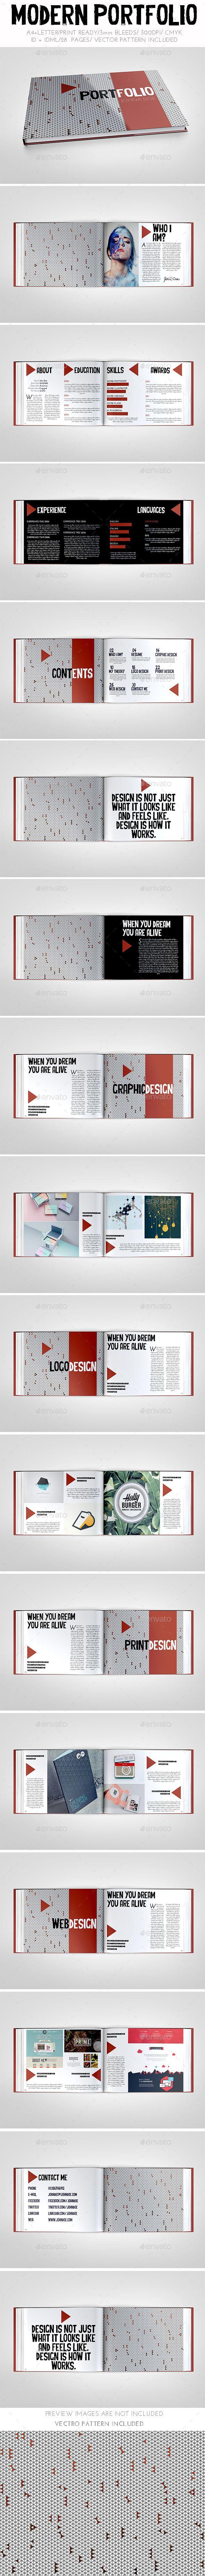 Modern Portfolio Brochure Template. Download: http://graphicriver.net/item/modern-portfolio-brochure/11290170?ref=ksioks